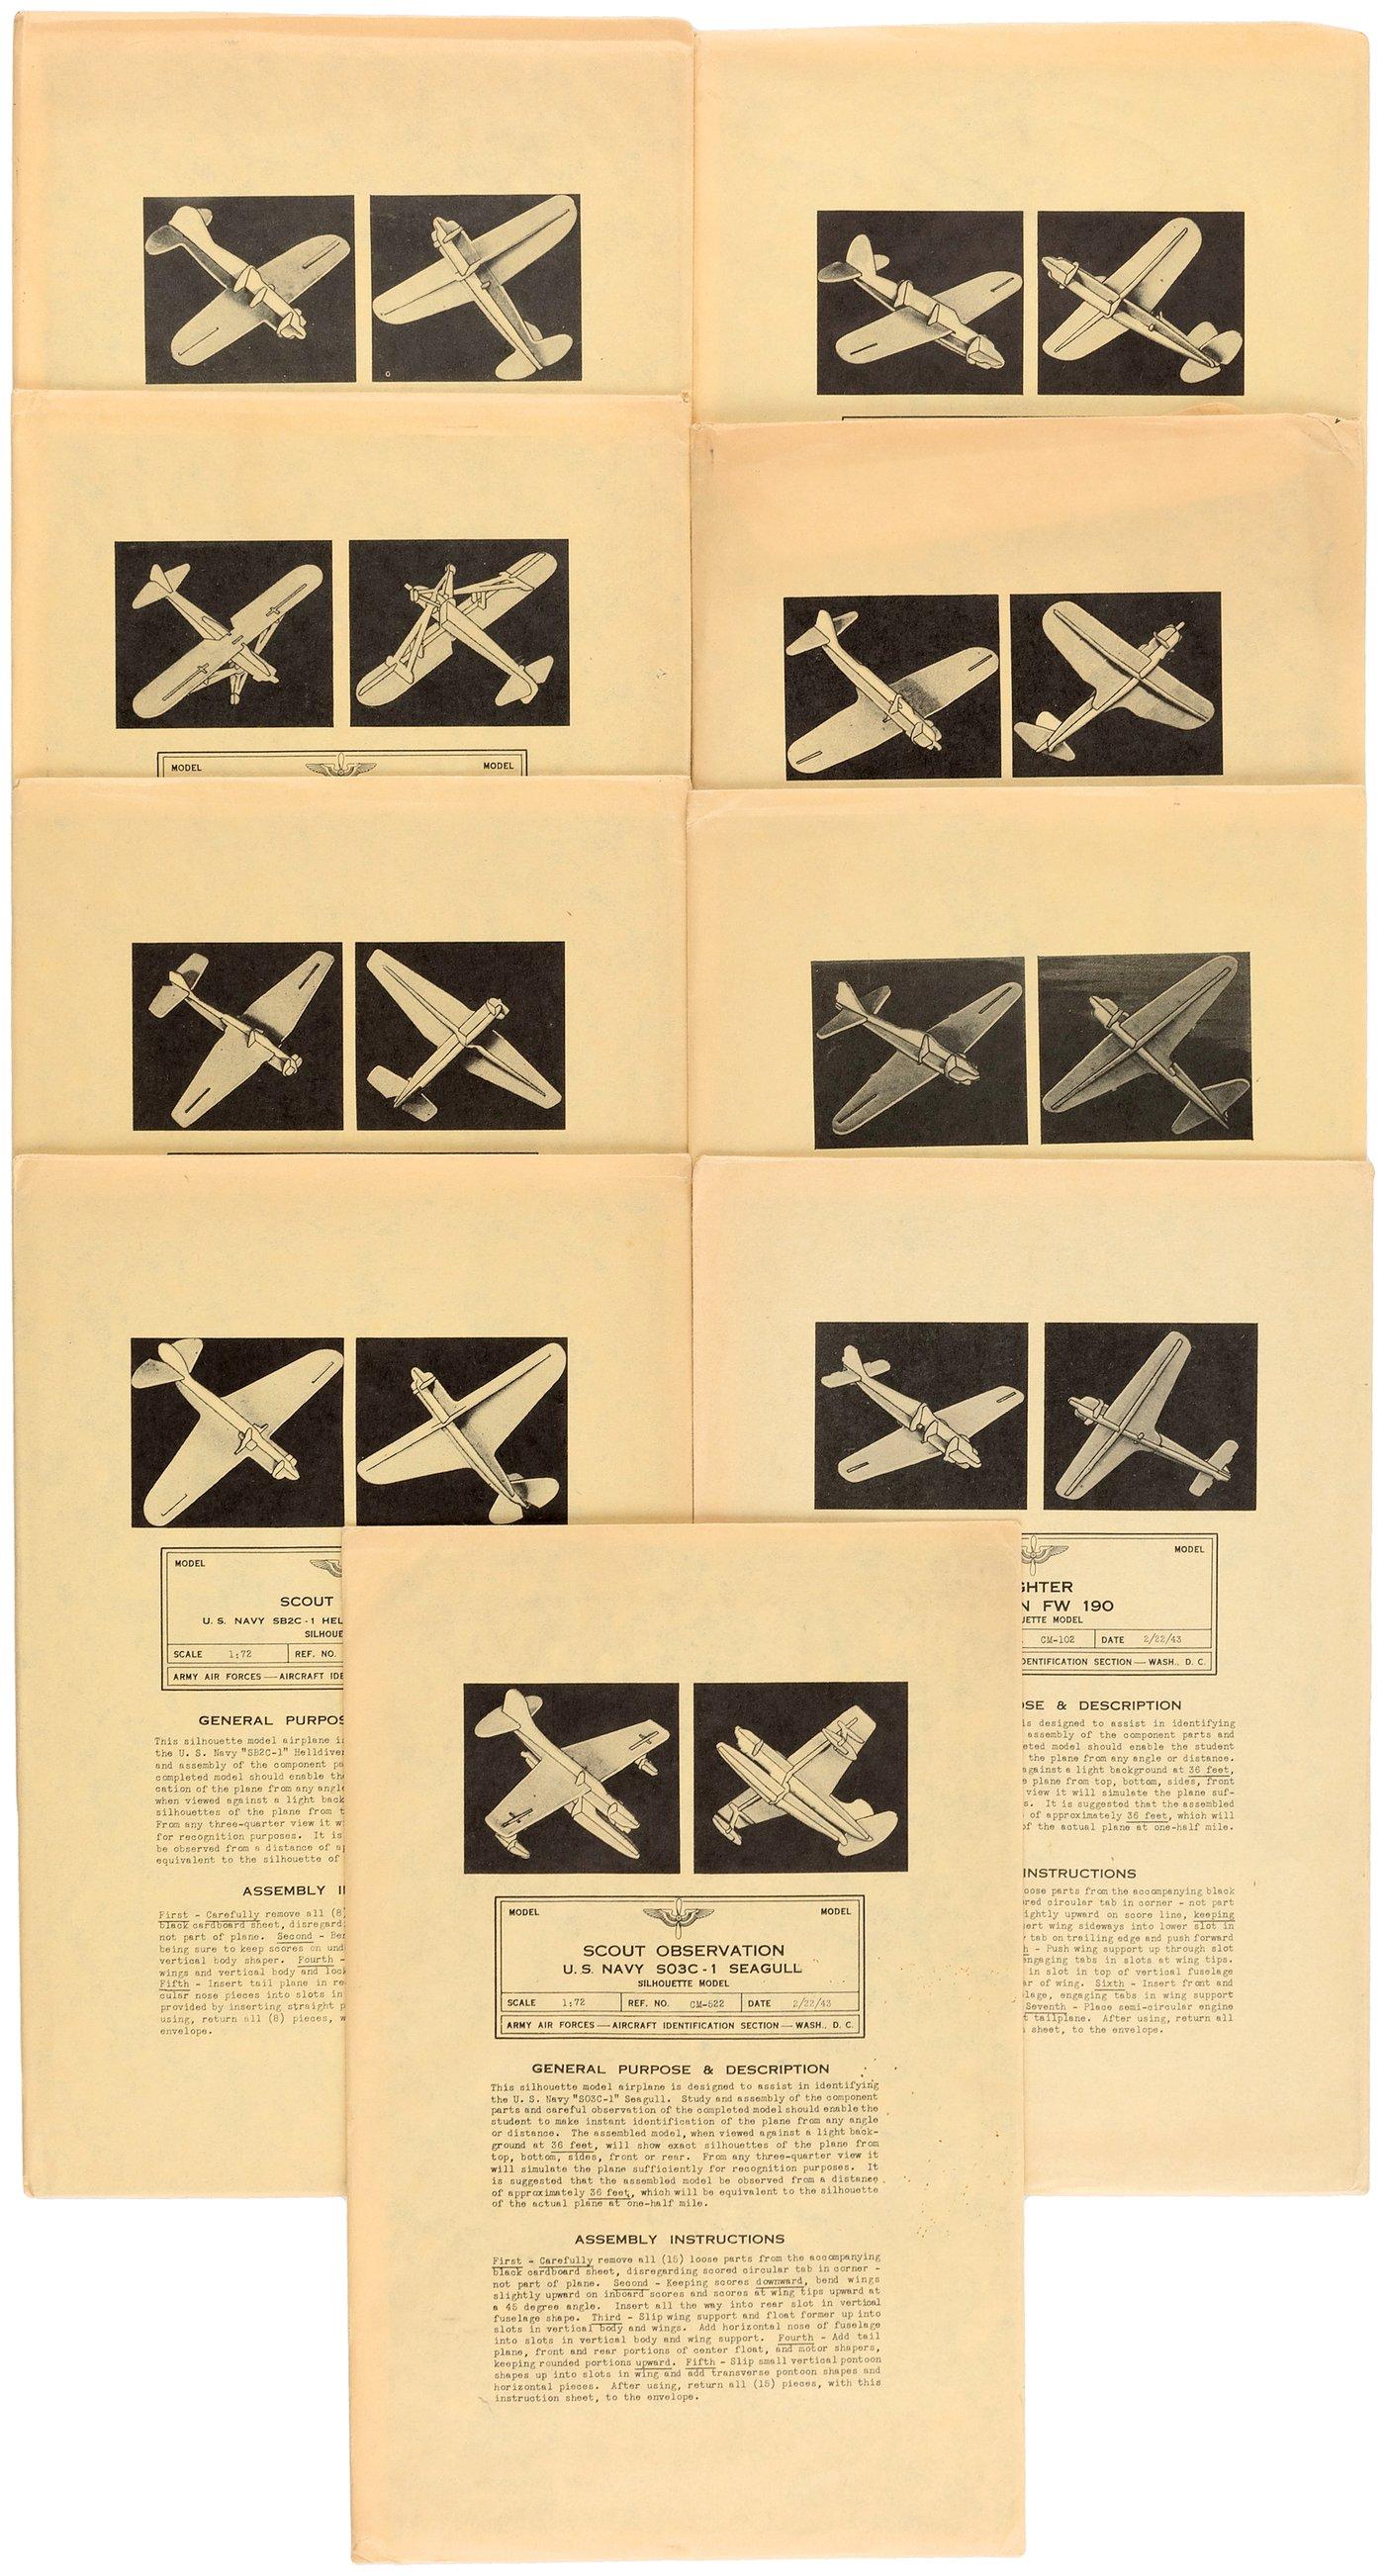 Hake S World War Ii Allied Axis Aircraft Identication Model Kit Lot